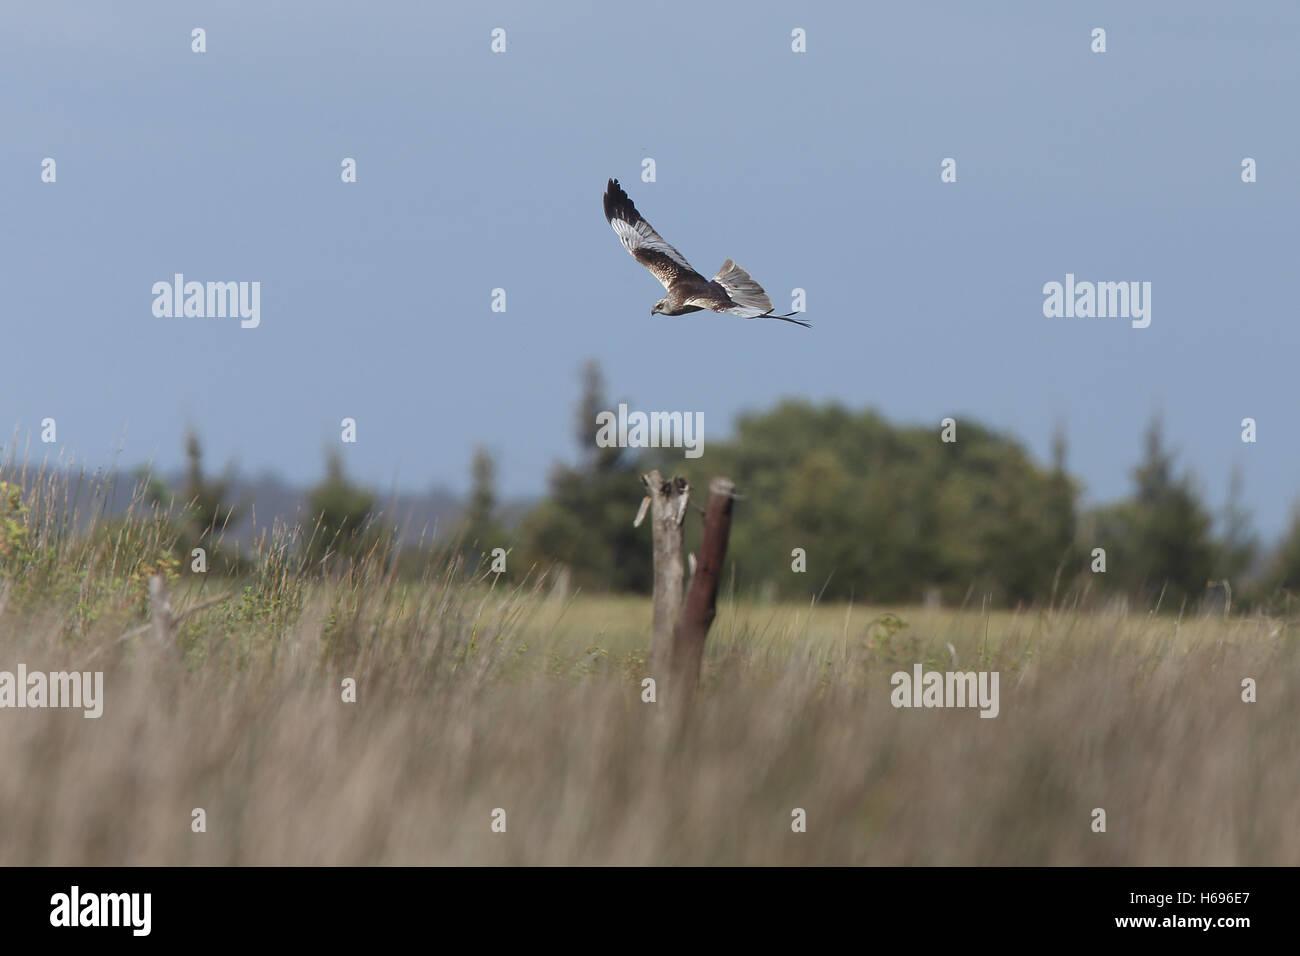 Marsh Harrier (Circus aeruginosus) male in flight over the marsh, Merja Zerga, Morocco. - Stock Image